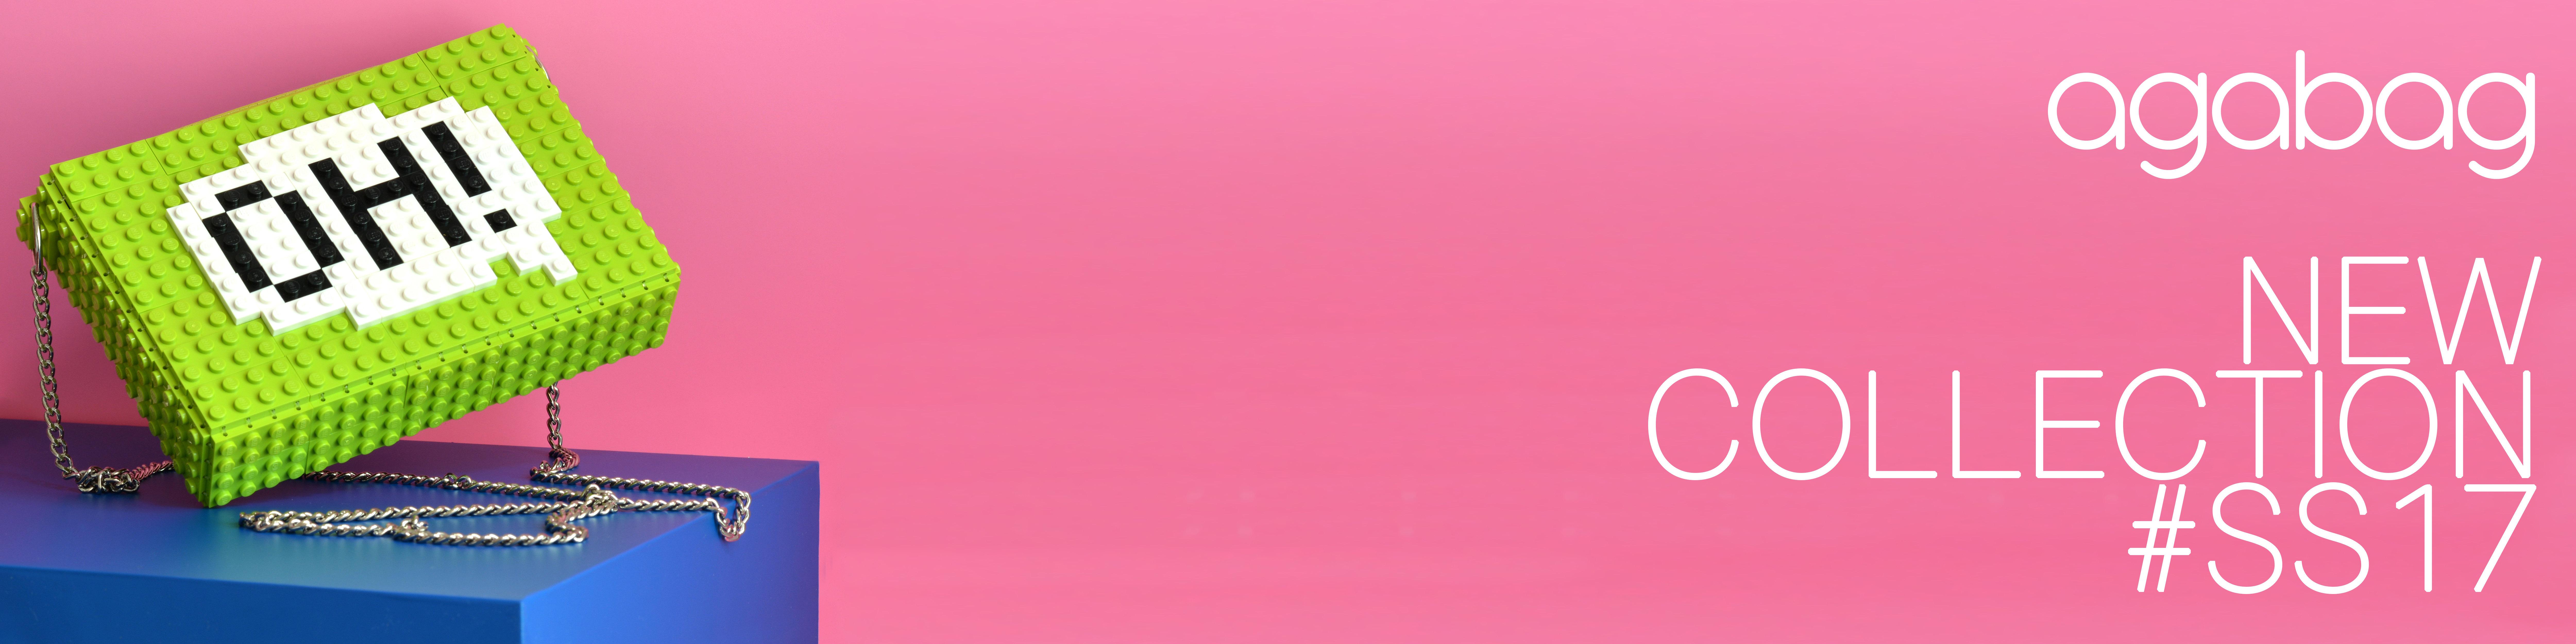 Data wydania: Darmowa dostawa sprzedaż online agabag by agabag on Etsy